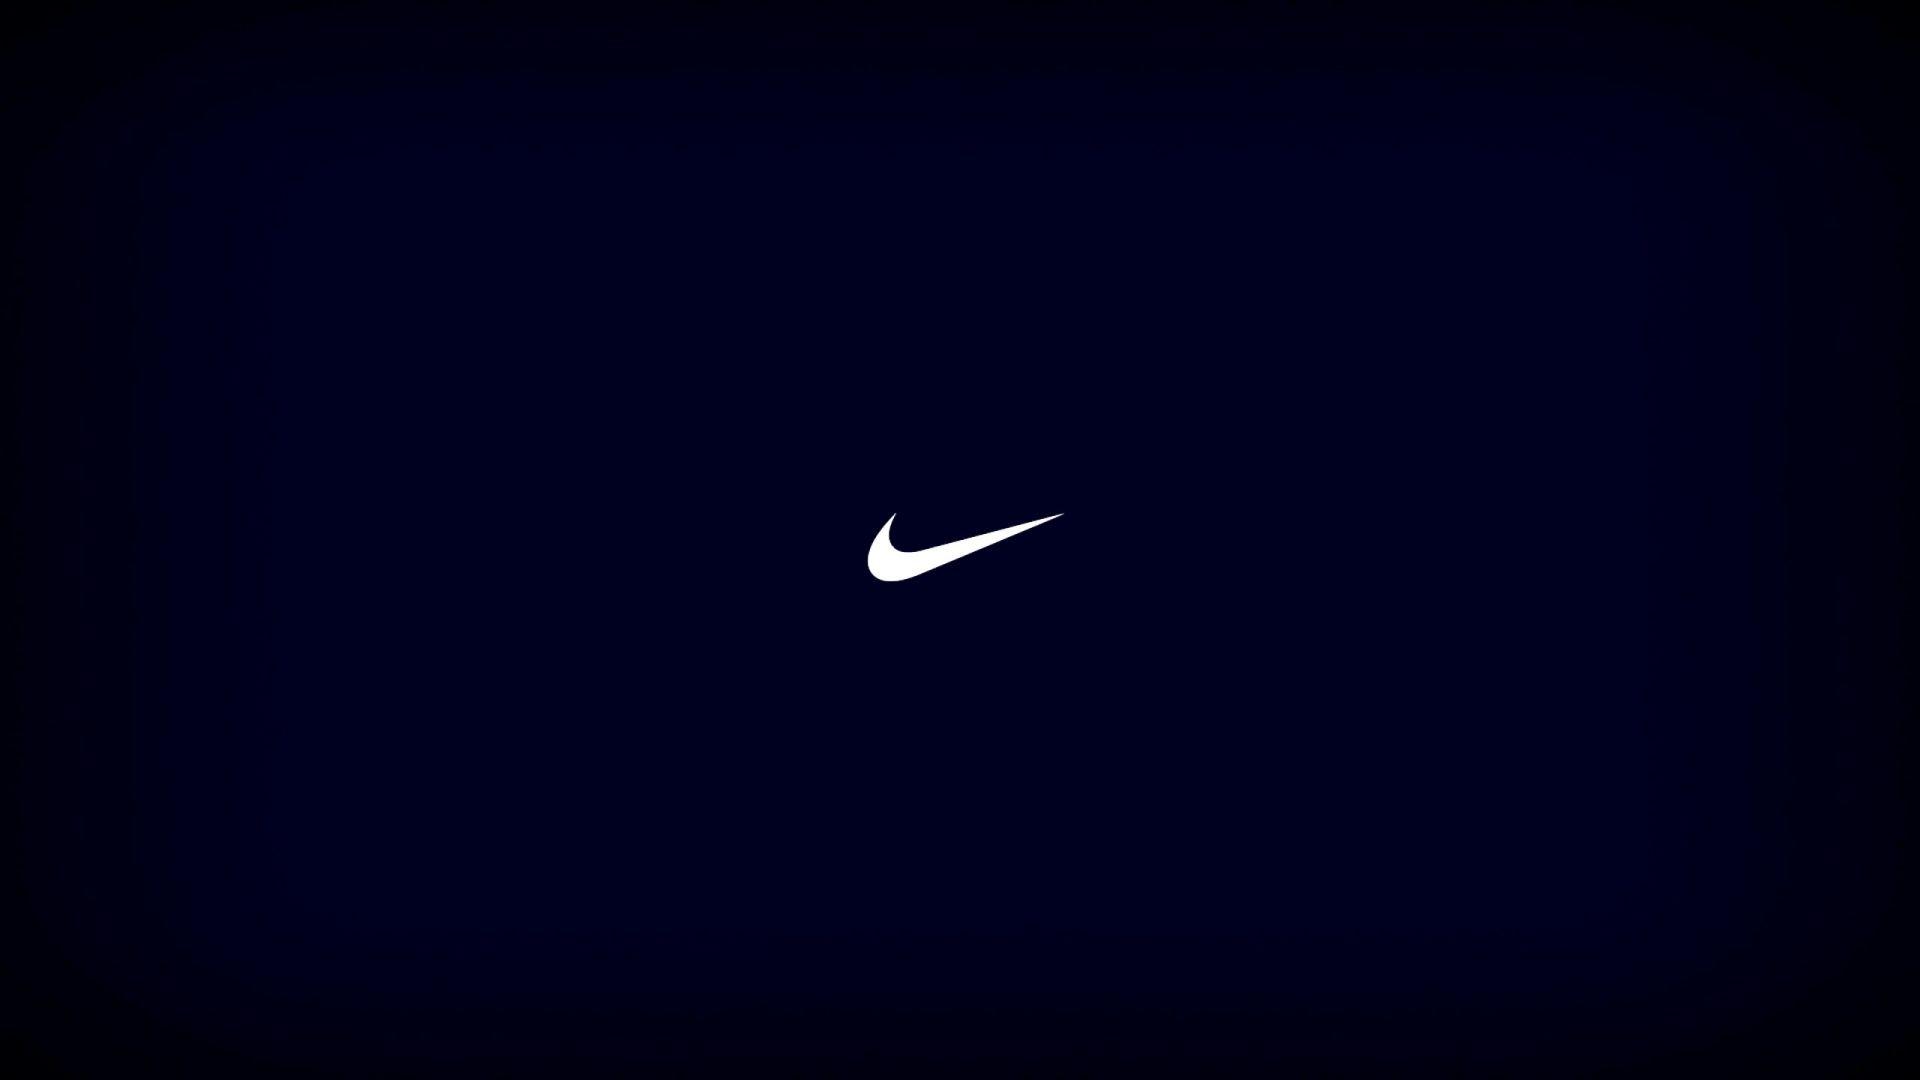 Nike Wallpaper Hd Download 1920x1080